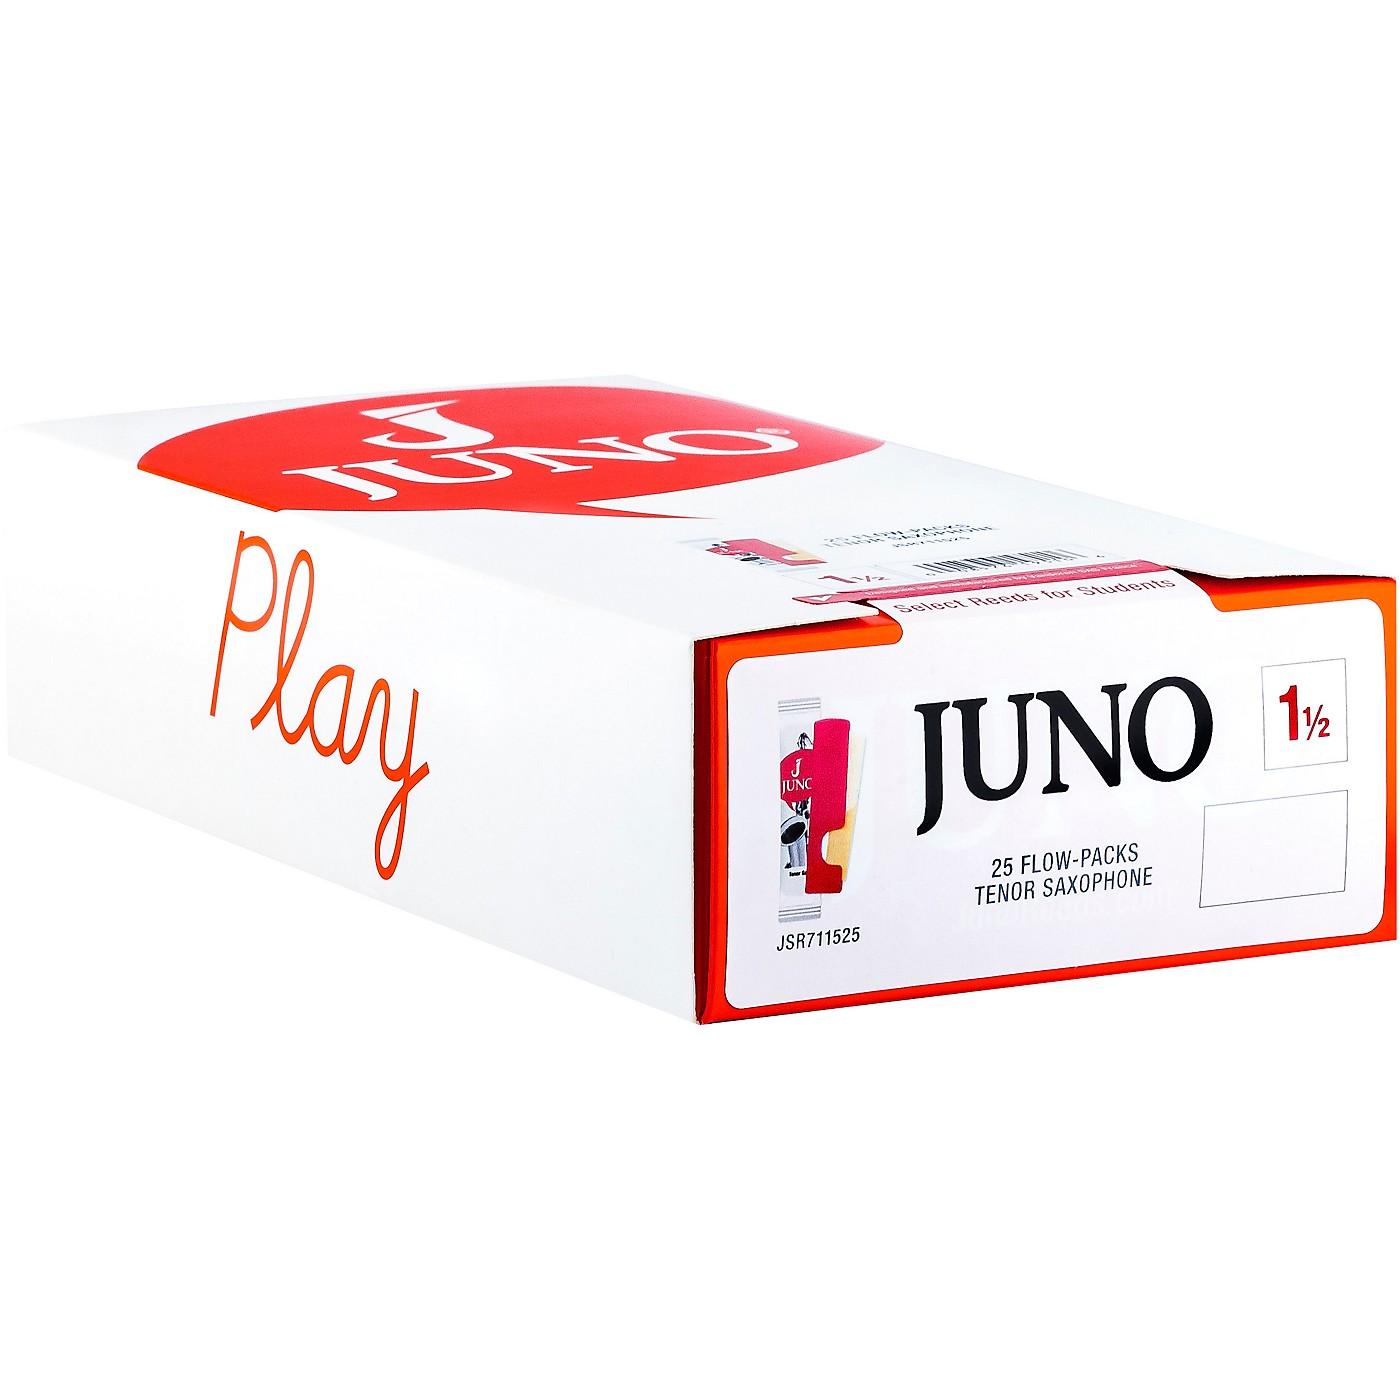 Vandoren JUNO Tenor Sax, Box of 25 Reeds thumbnail